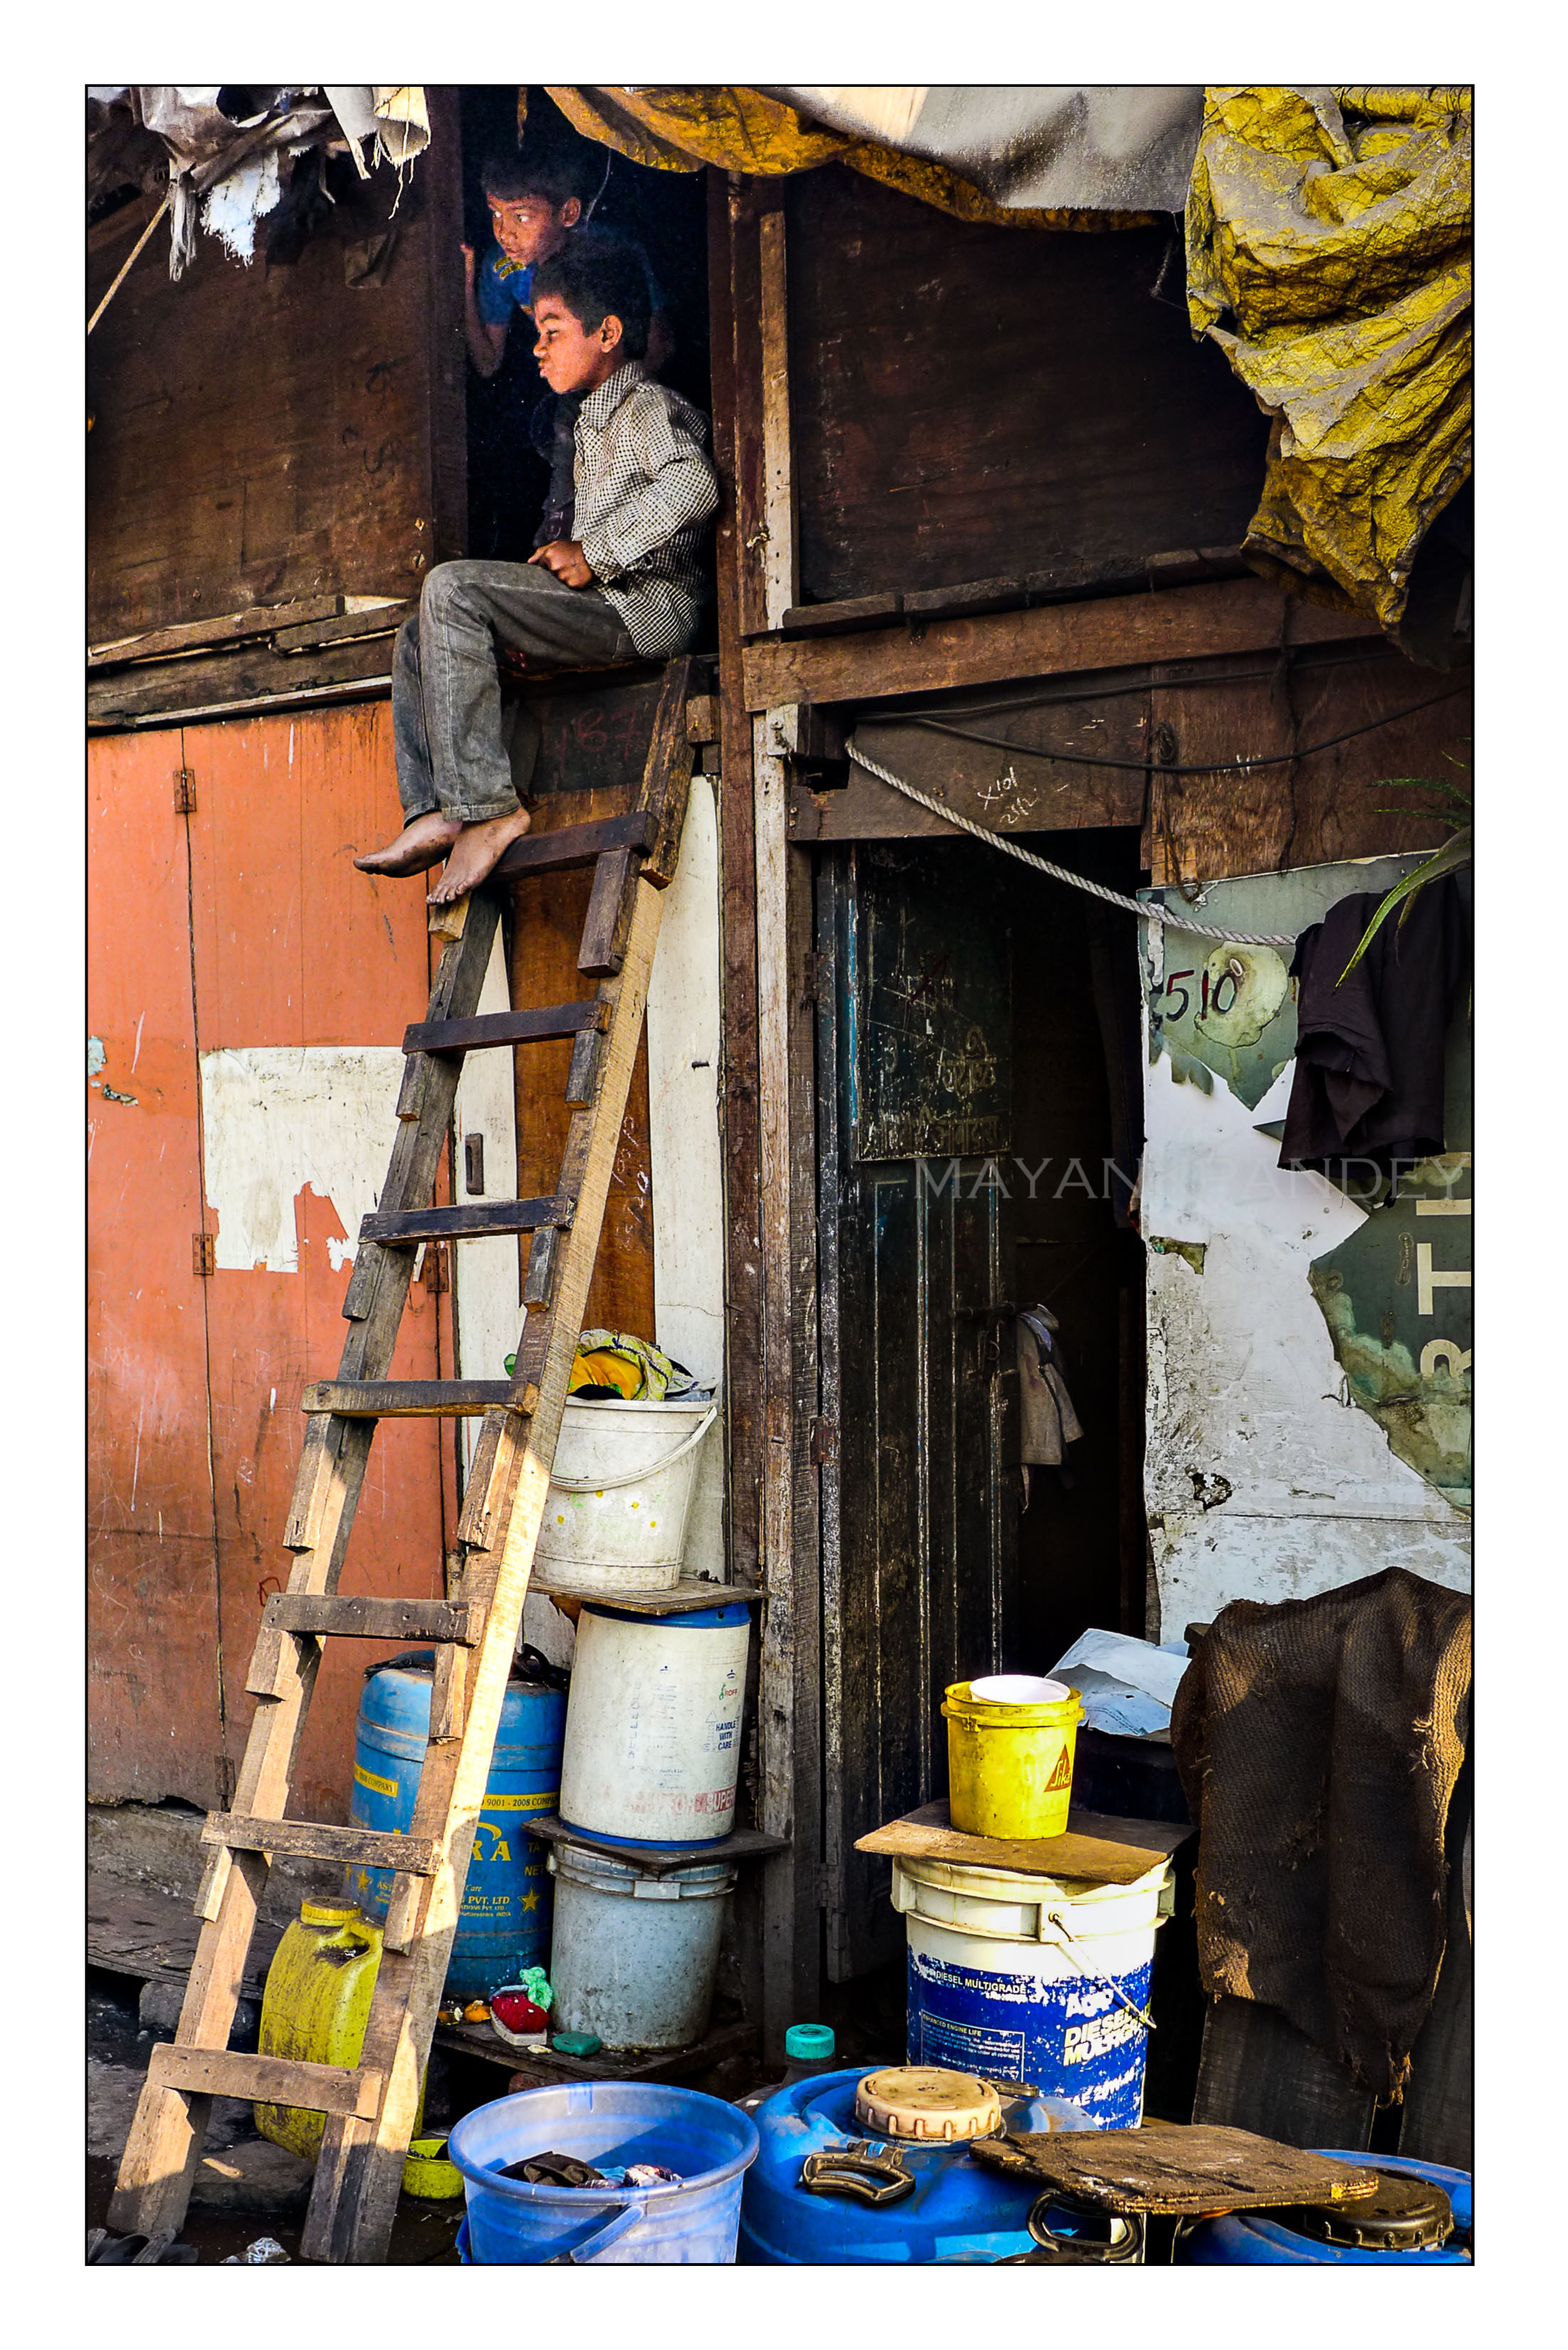 Home - Mayank Pandey amateur photographer from Mumbai India online photo exhibition street [hotography black and white Маянк Пандей фотограф любитель из Мумбай Индия онлайн фотовыставка стрит фотография черно белый